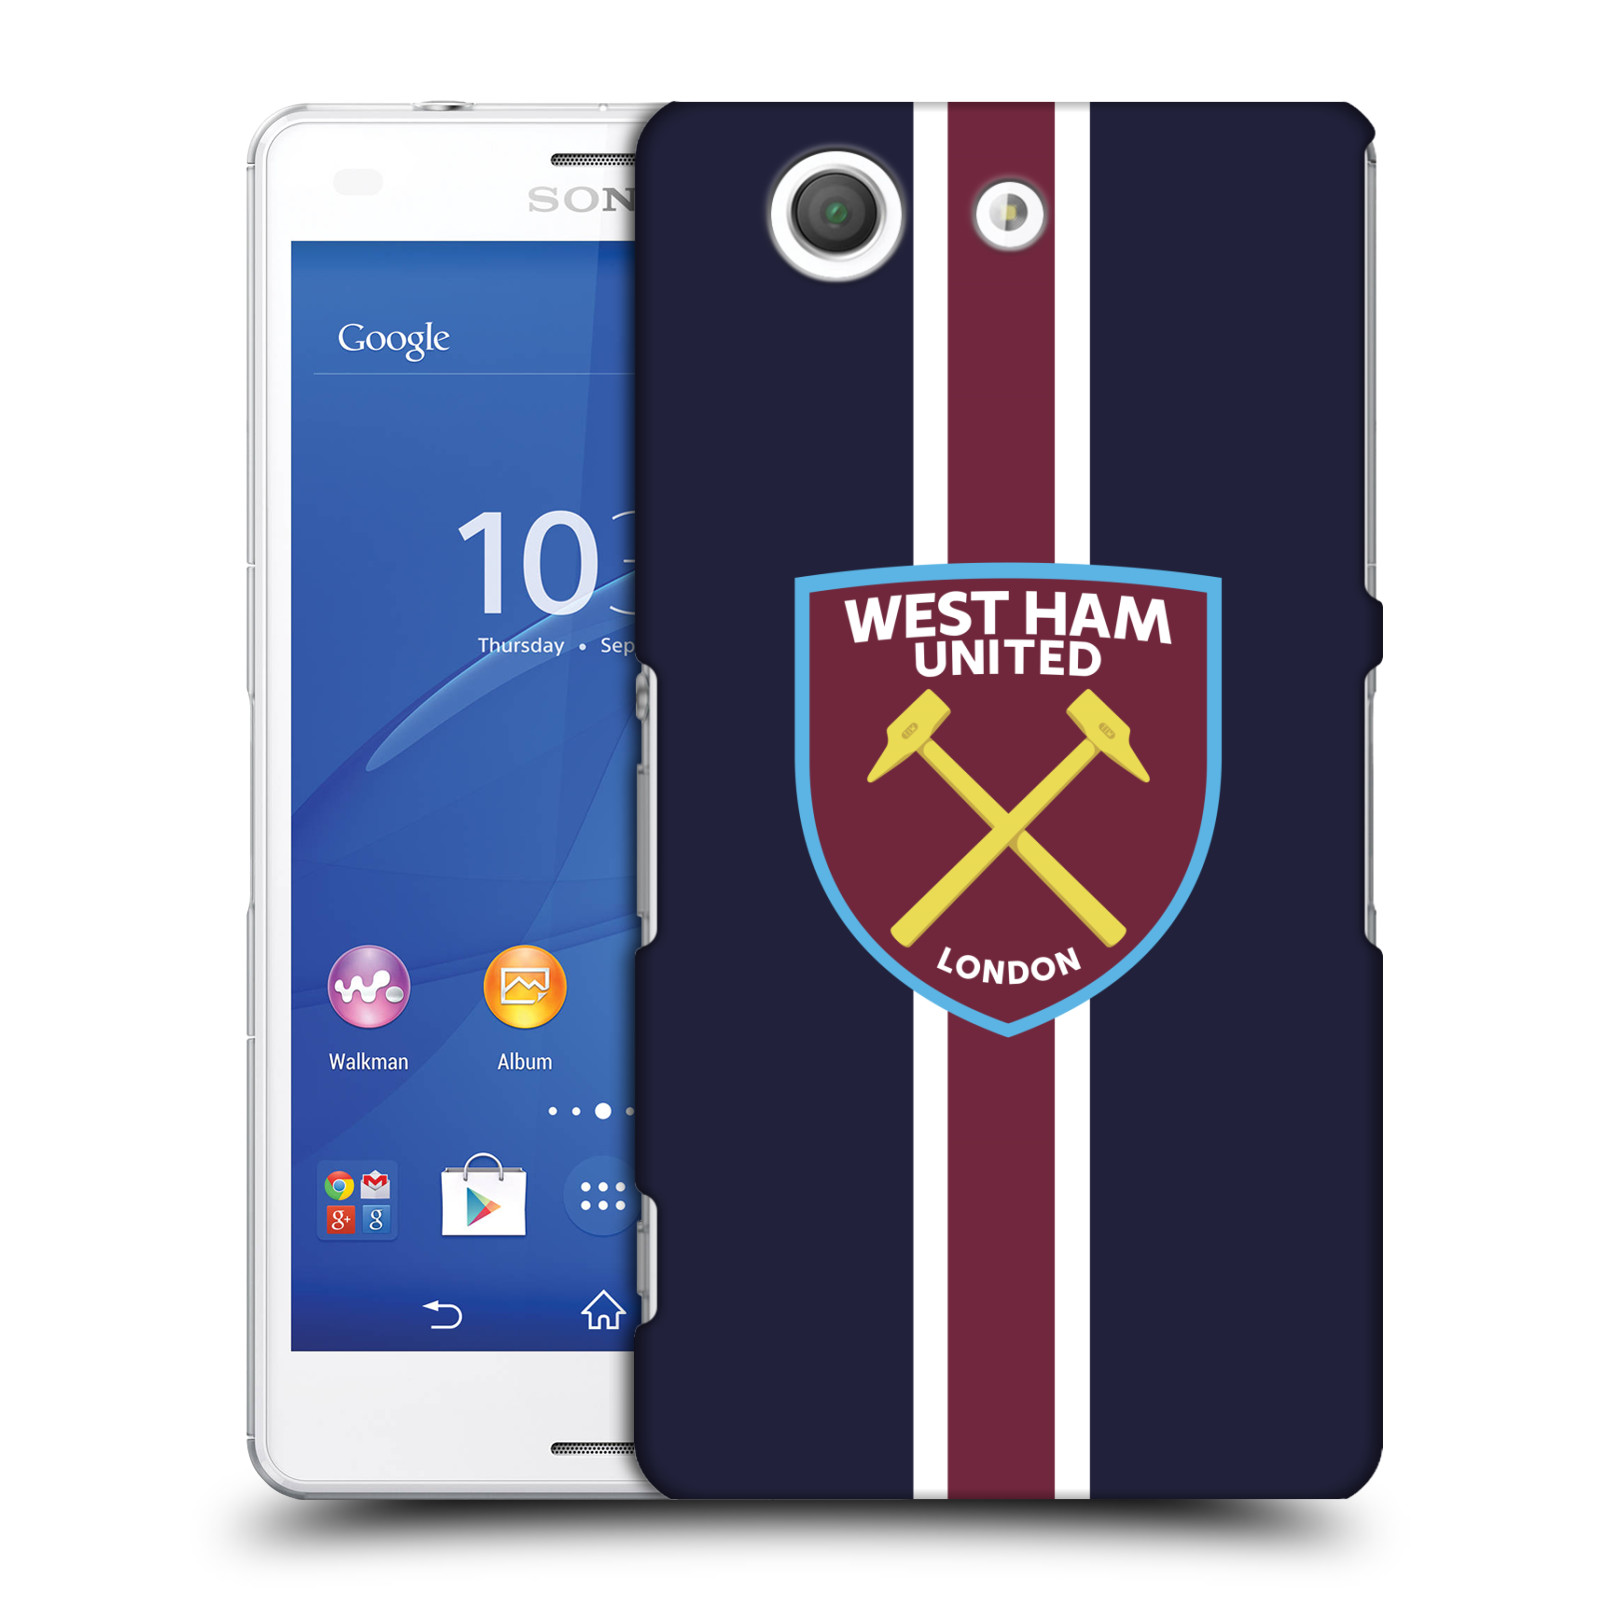 Plastové pouzdro na mobil Sony Xperia Z3 Compact D5803 - Head Case - West Ham United - Pruhy